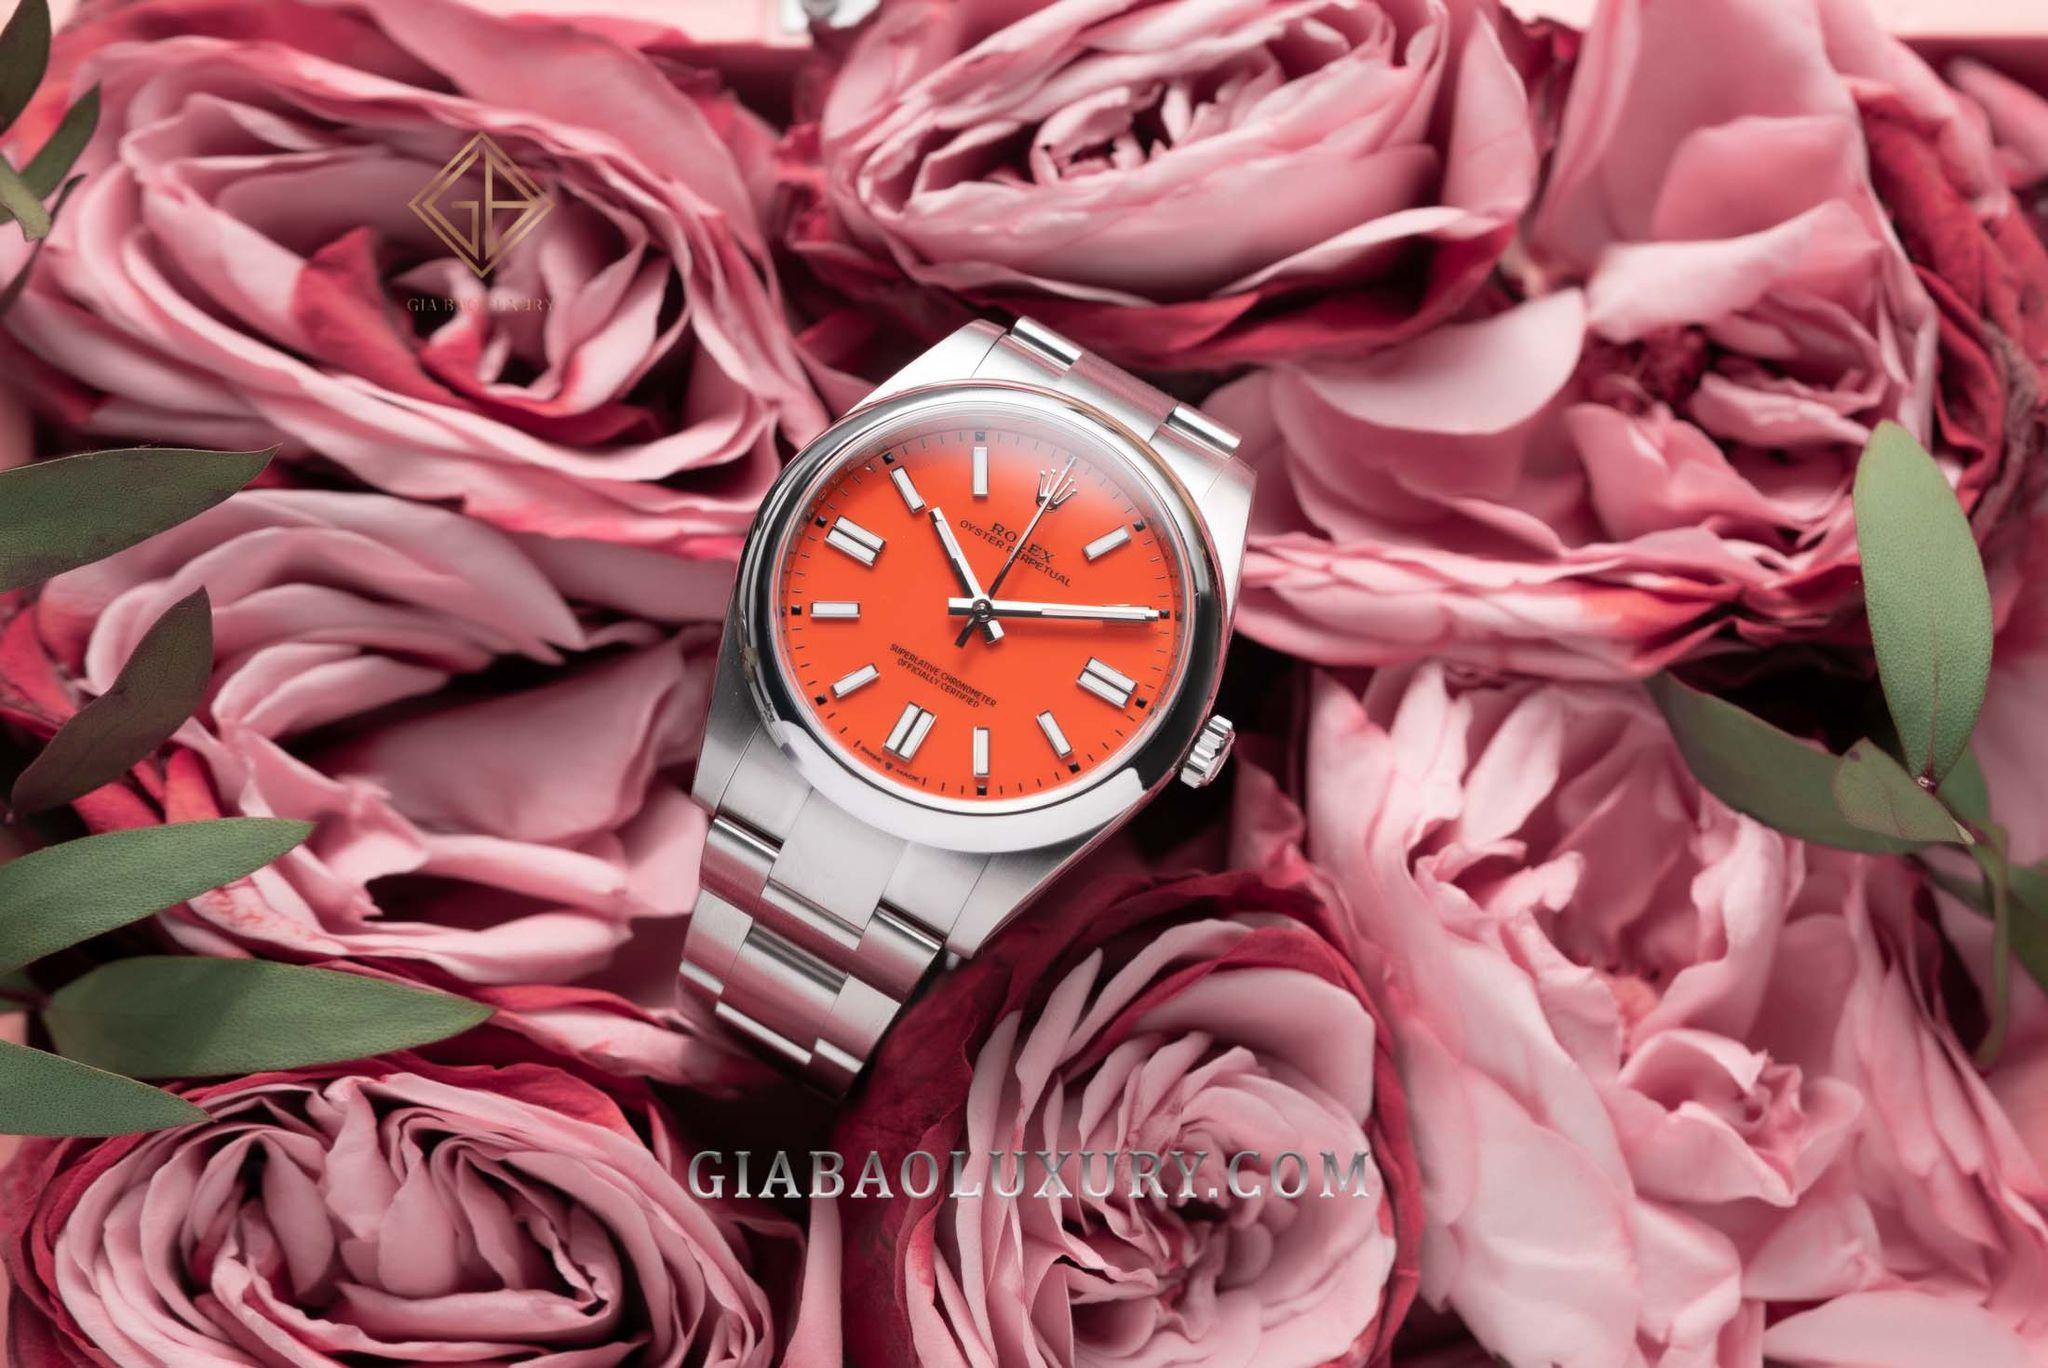 Đồng Hồ Rolex Oyster Perpetual 41 124300 Mặt Số Đỏ